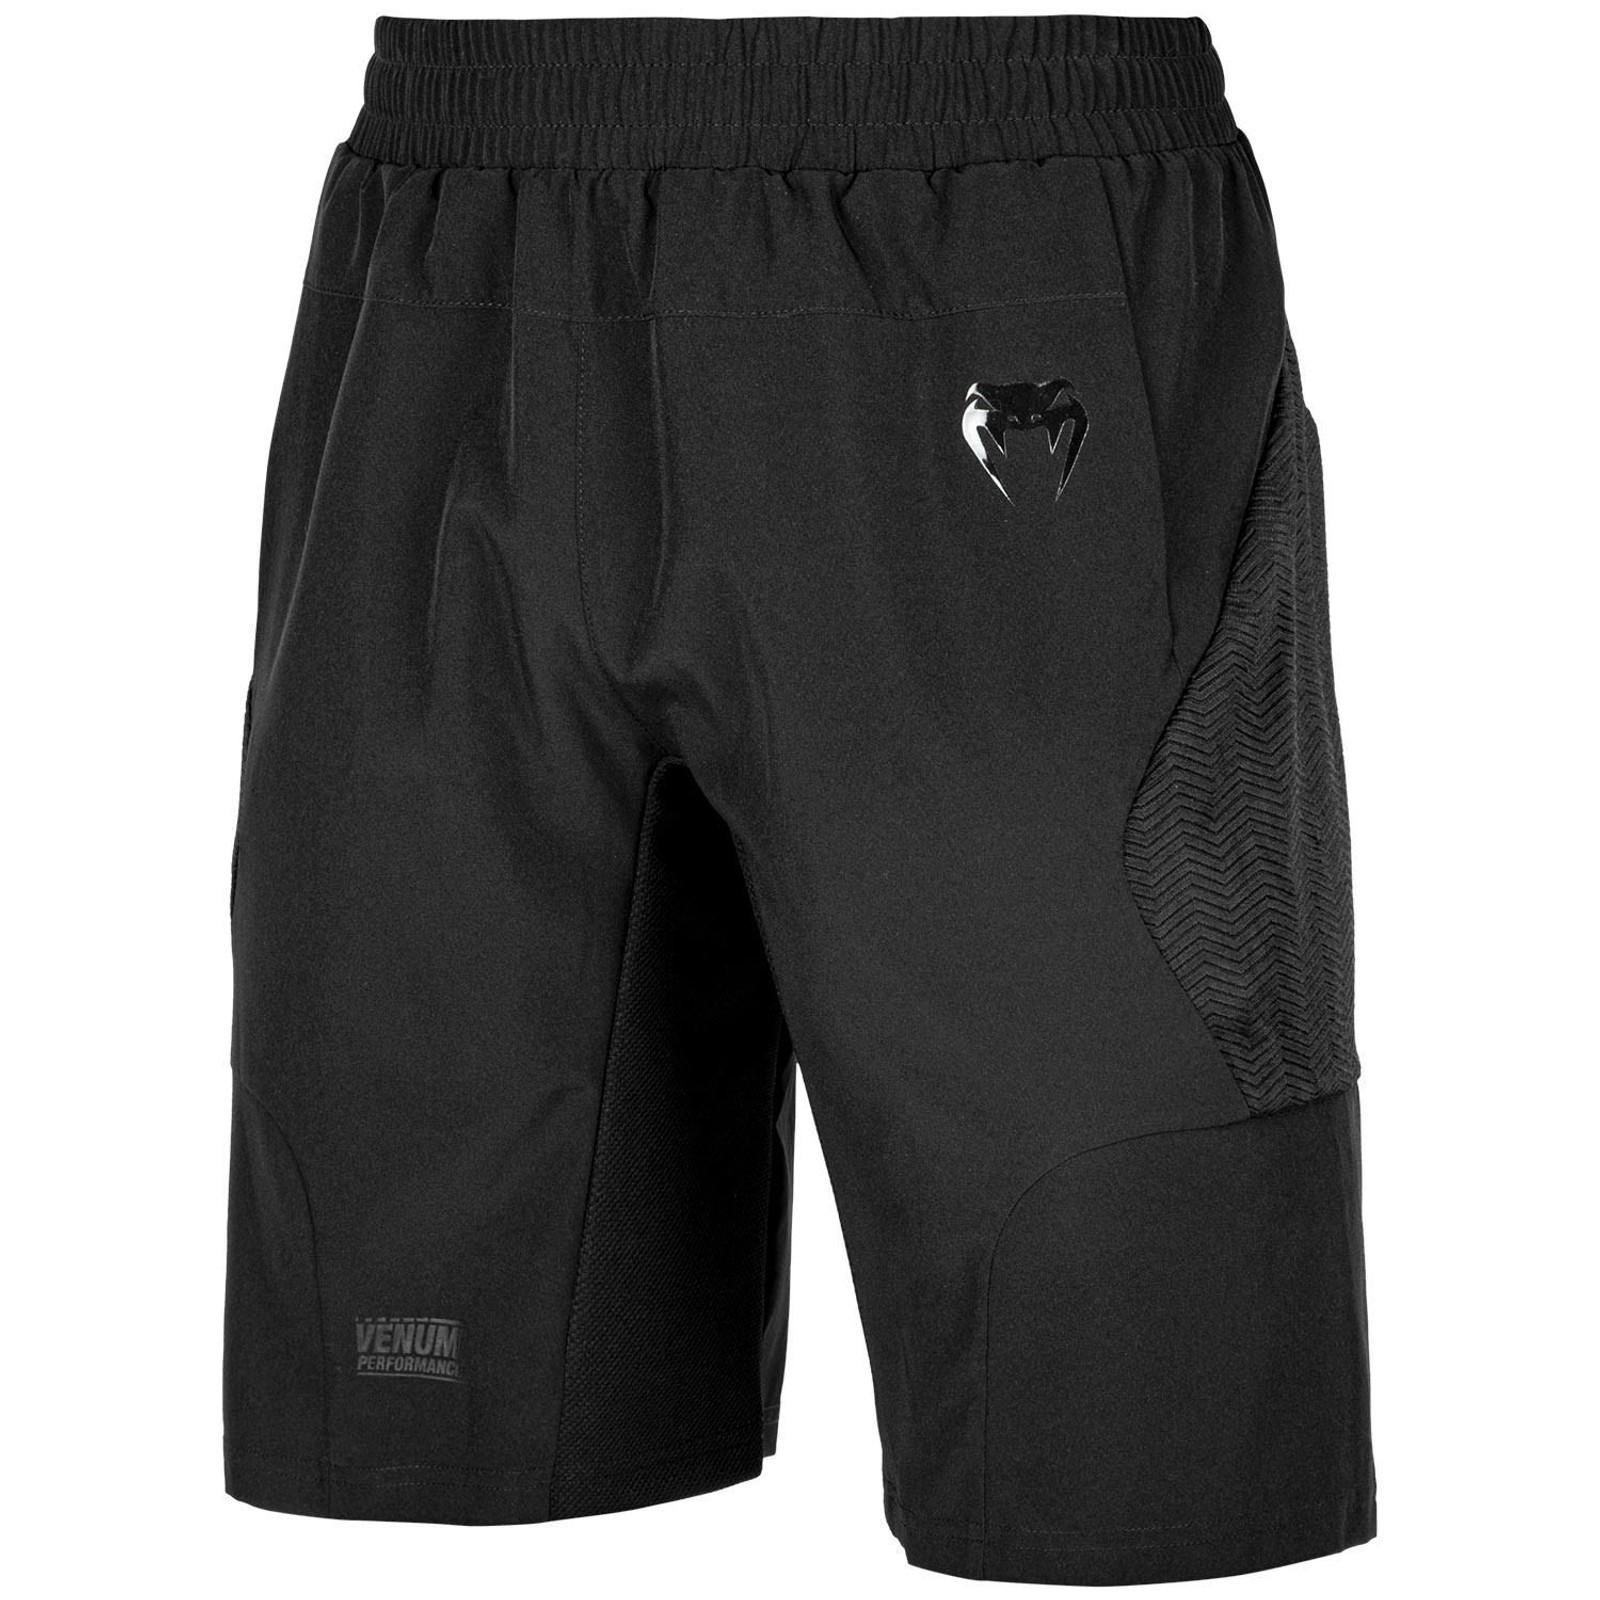 Venum Herren Training Shorts G-Fit